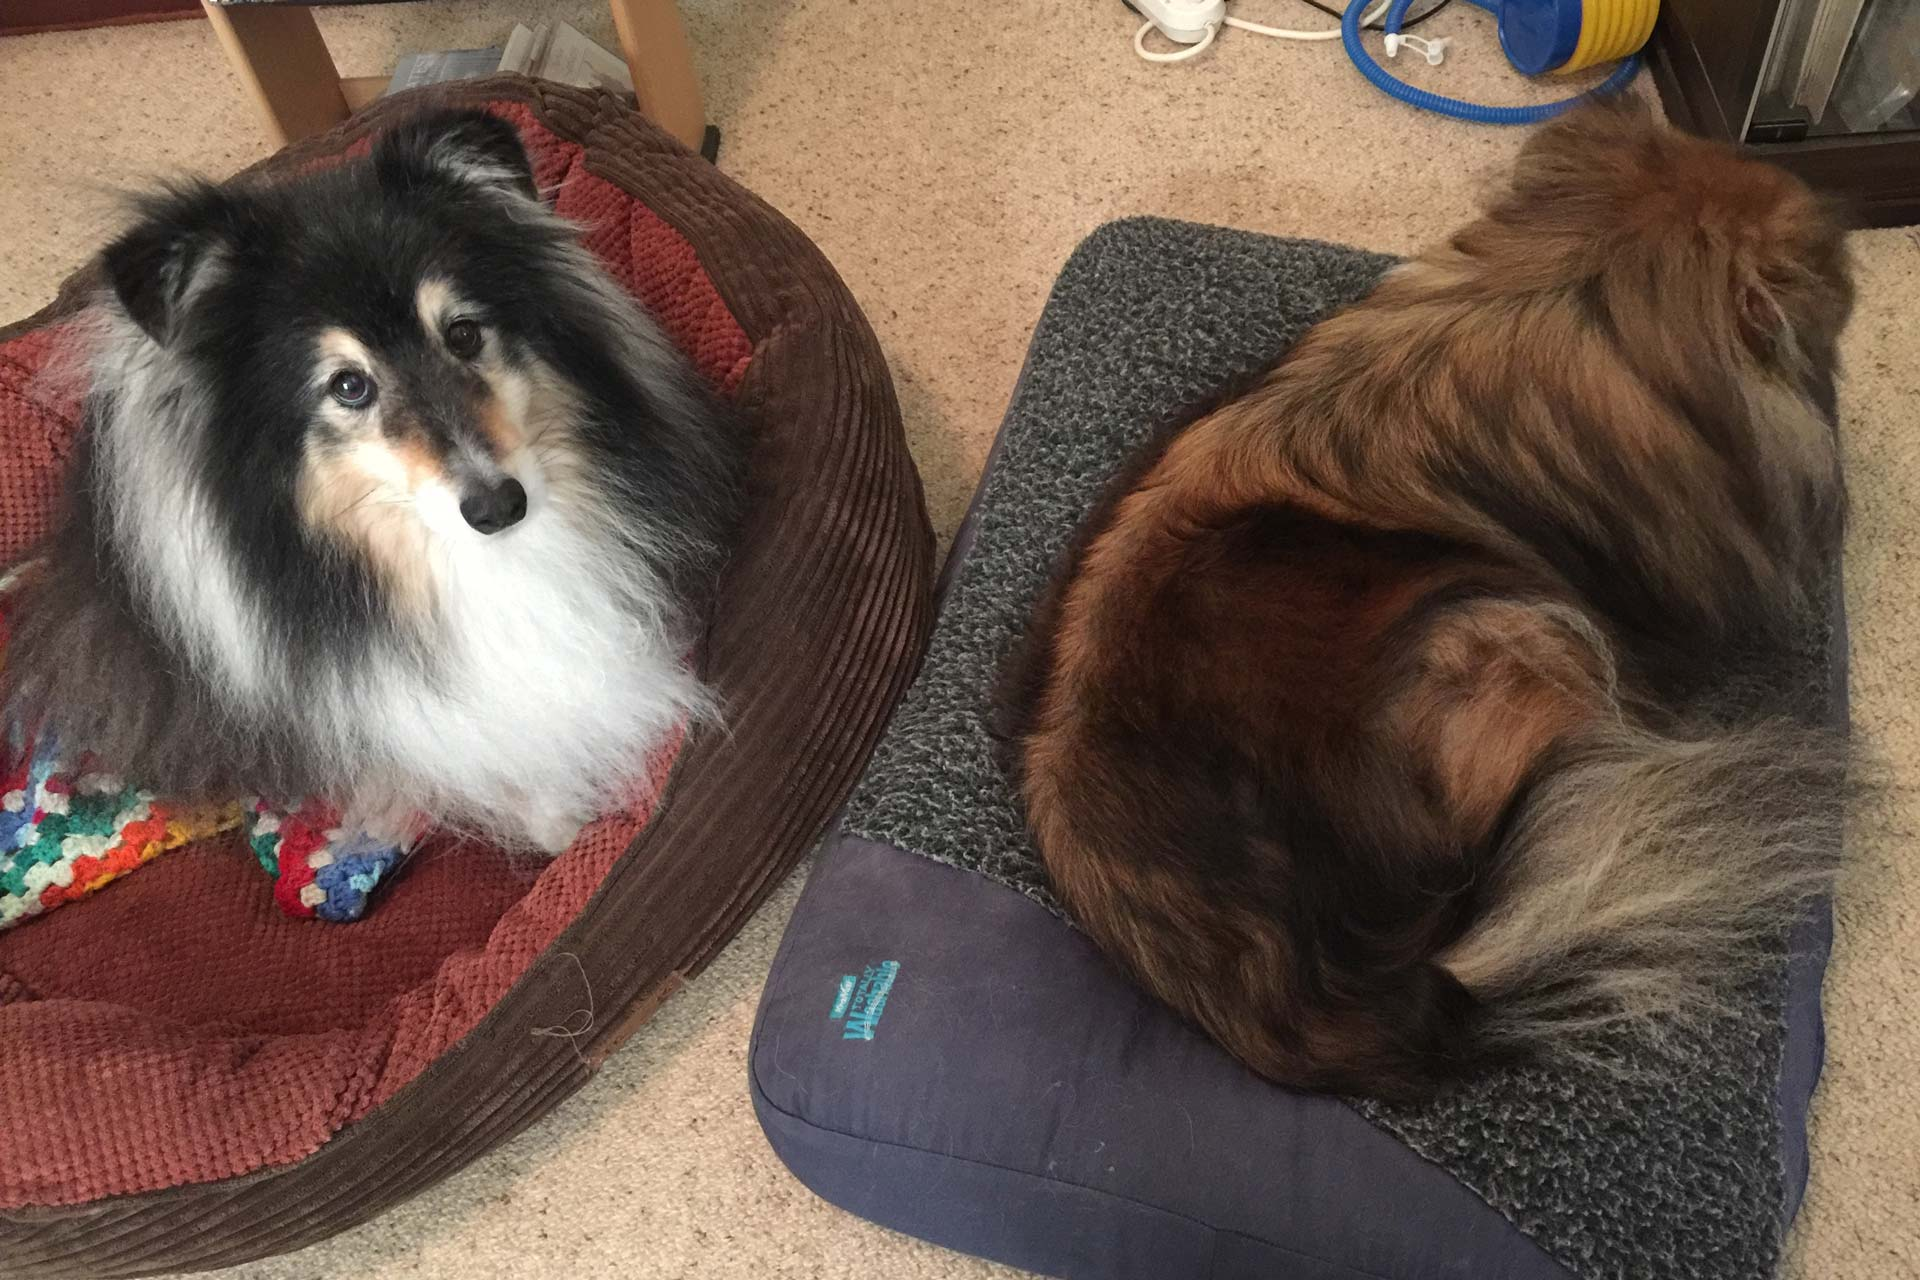 Perth Pet Sitting, Dogs on Mats